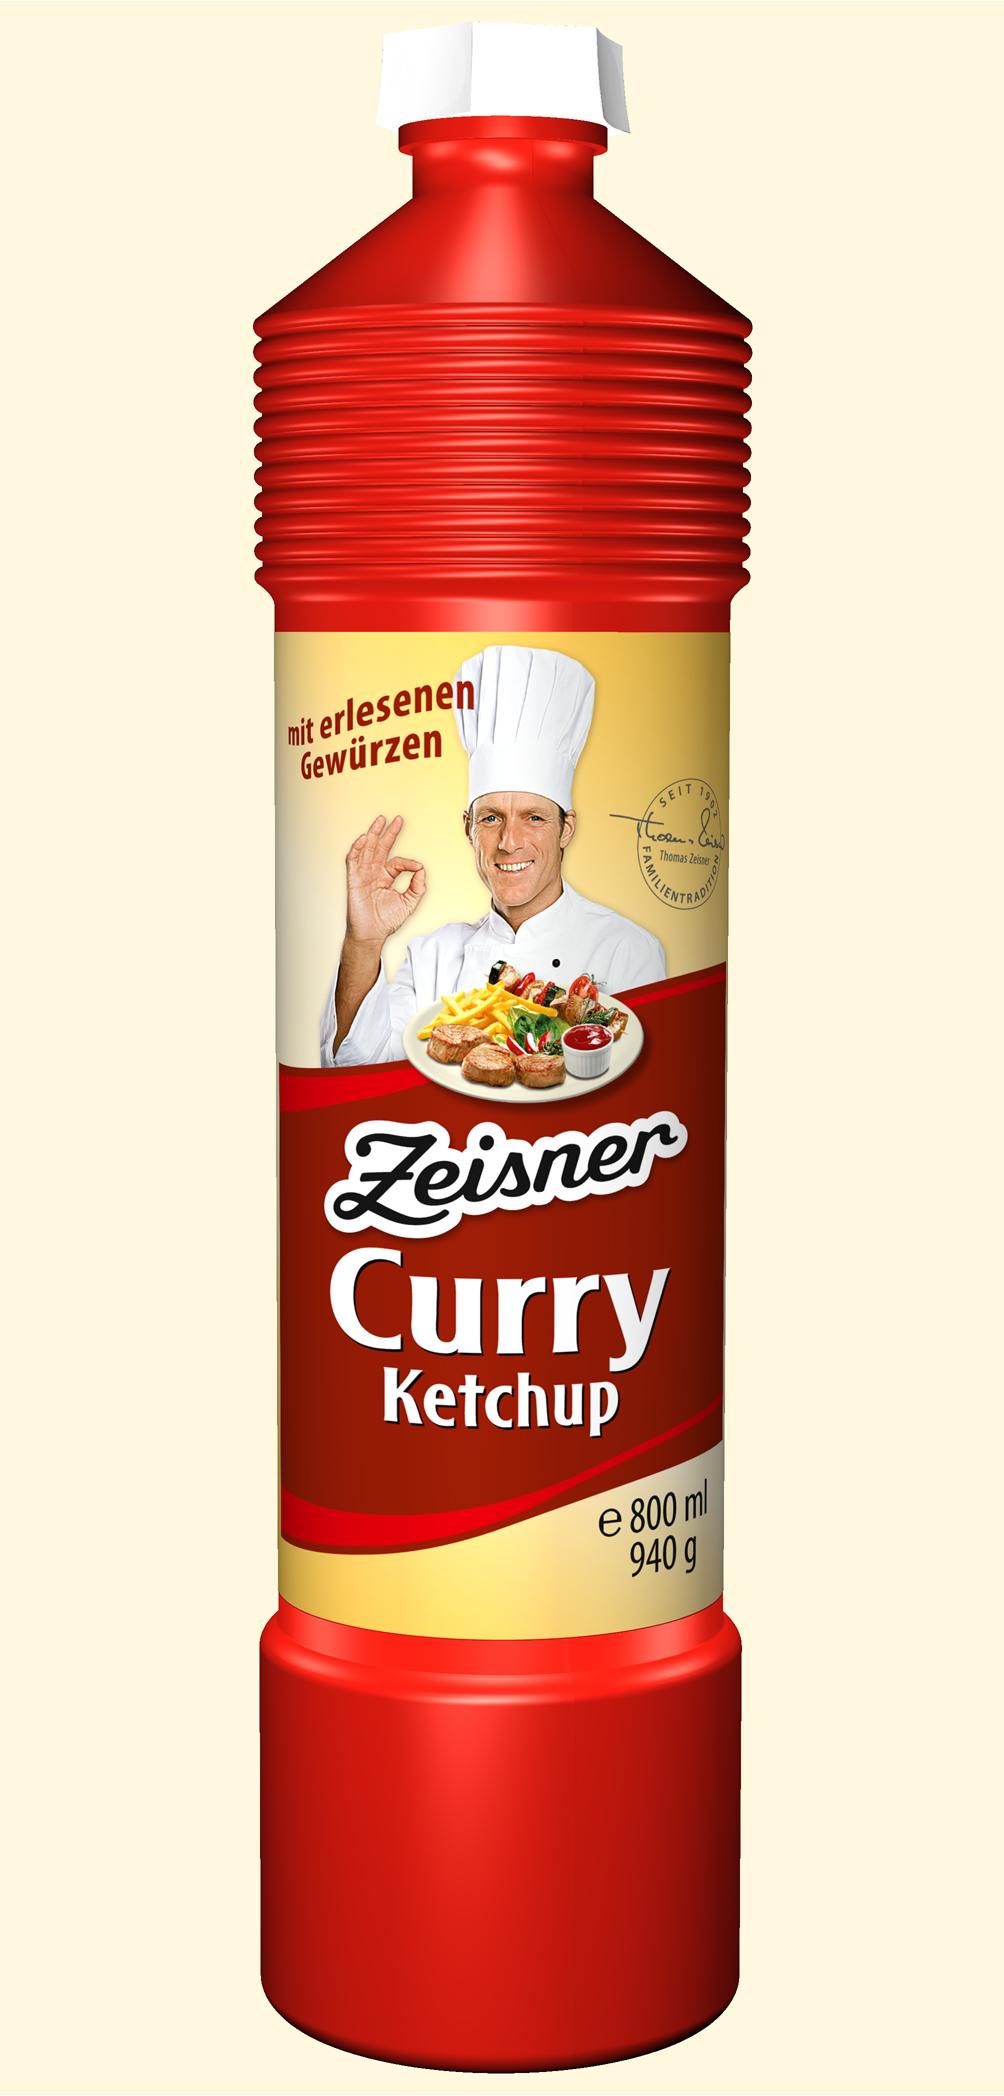 Zeisner Curry-Ketchup 800ml Flasche